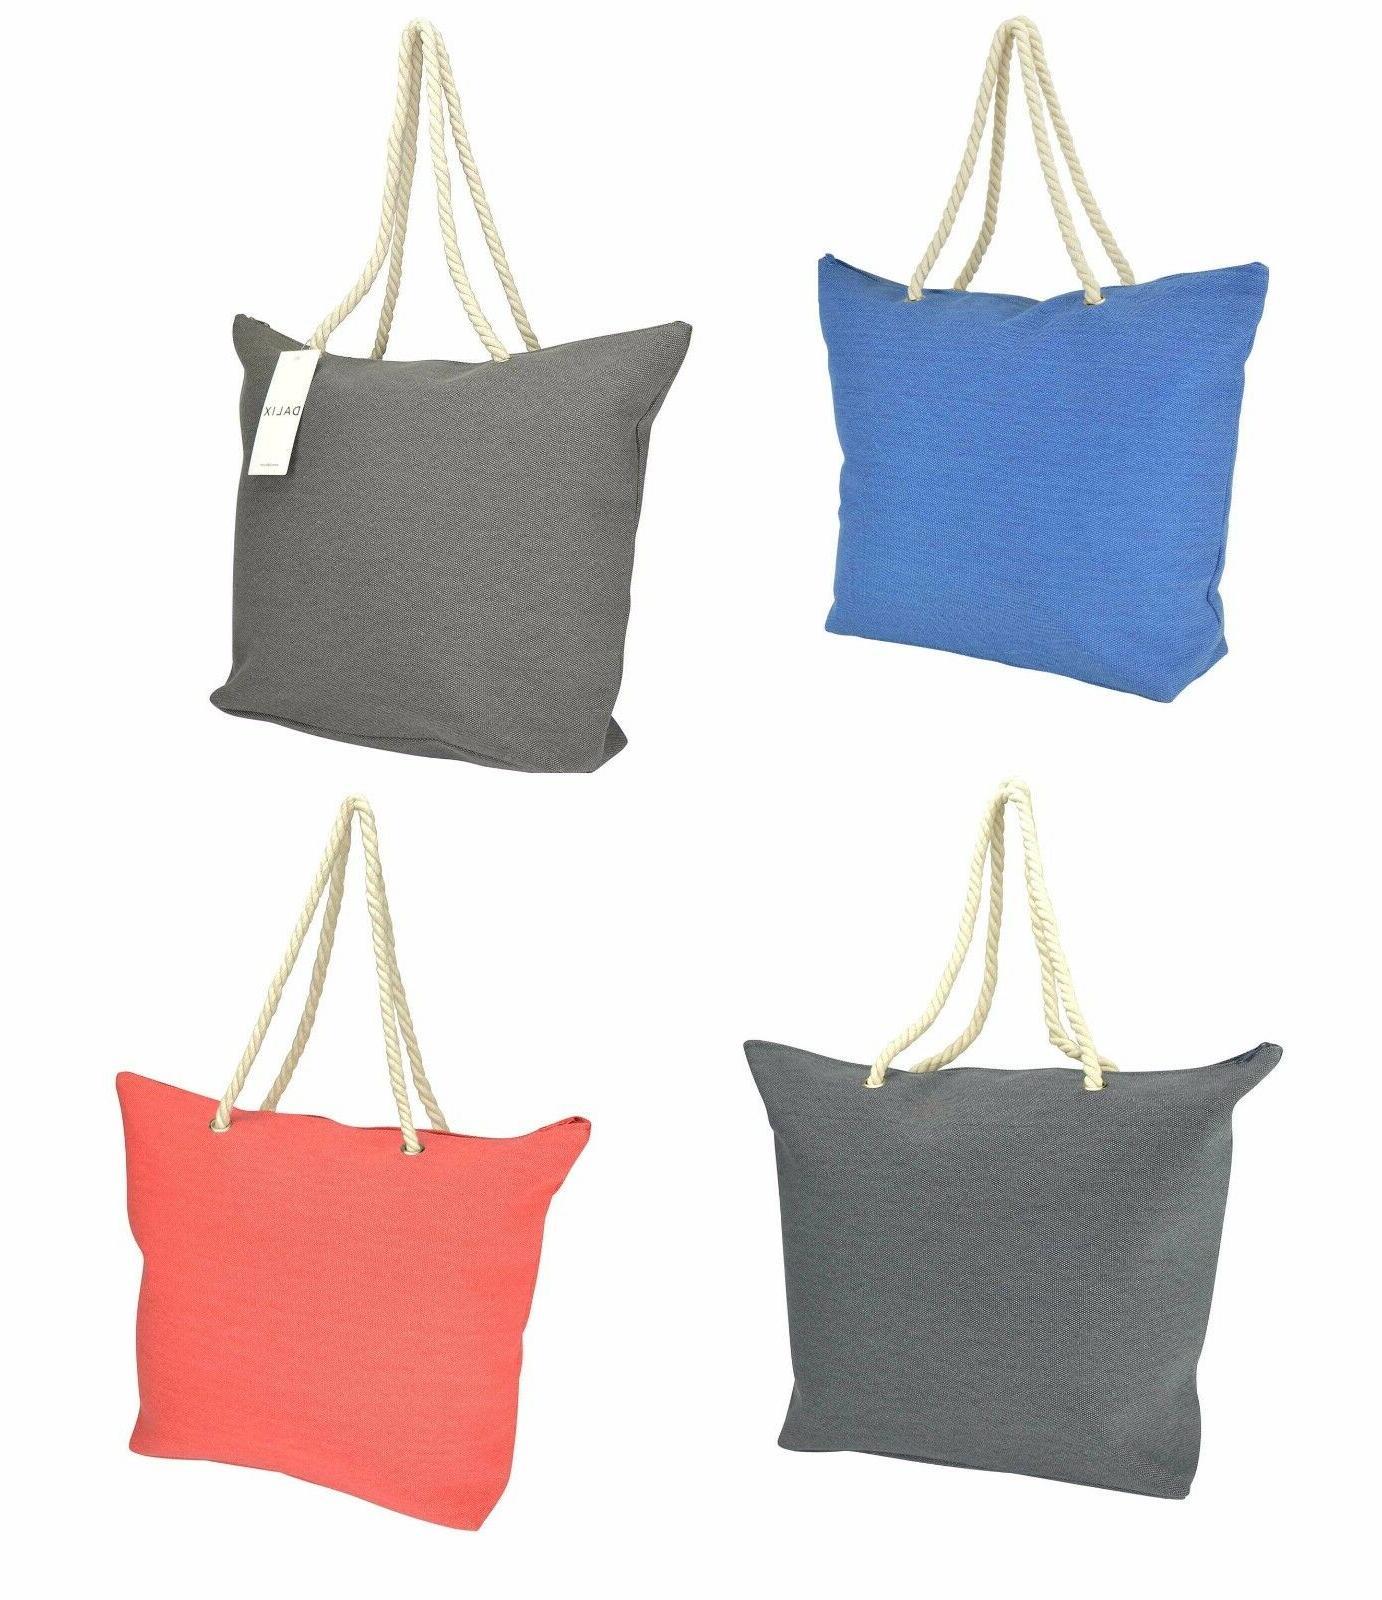 DALIX Elegant Woven Canvas Tote Bag w/ Rope Handle Gray Grey